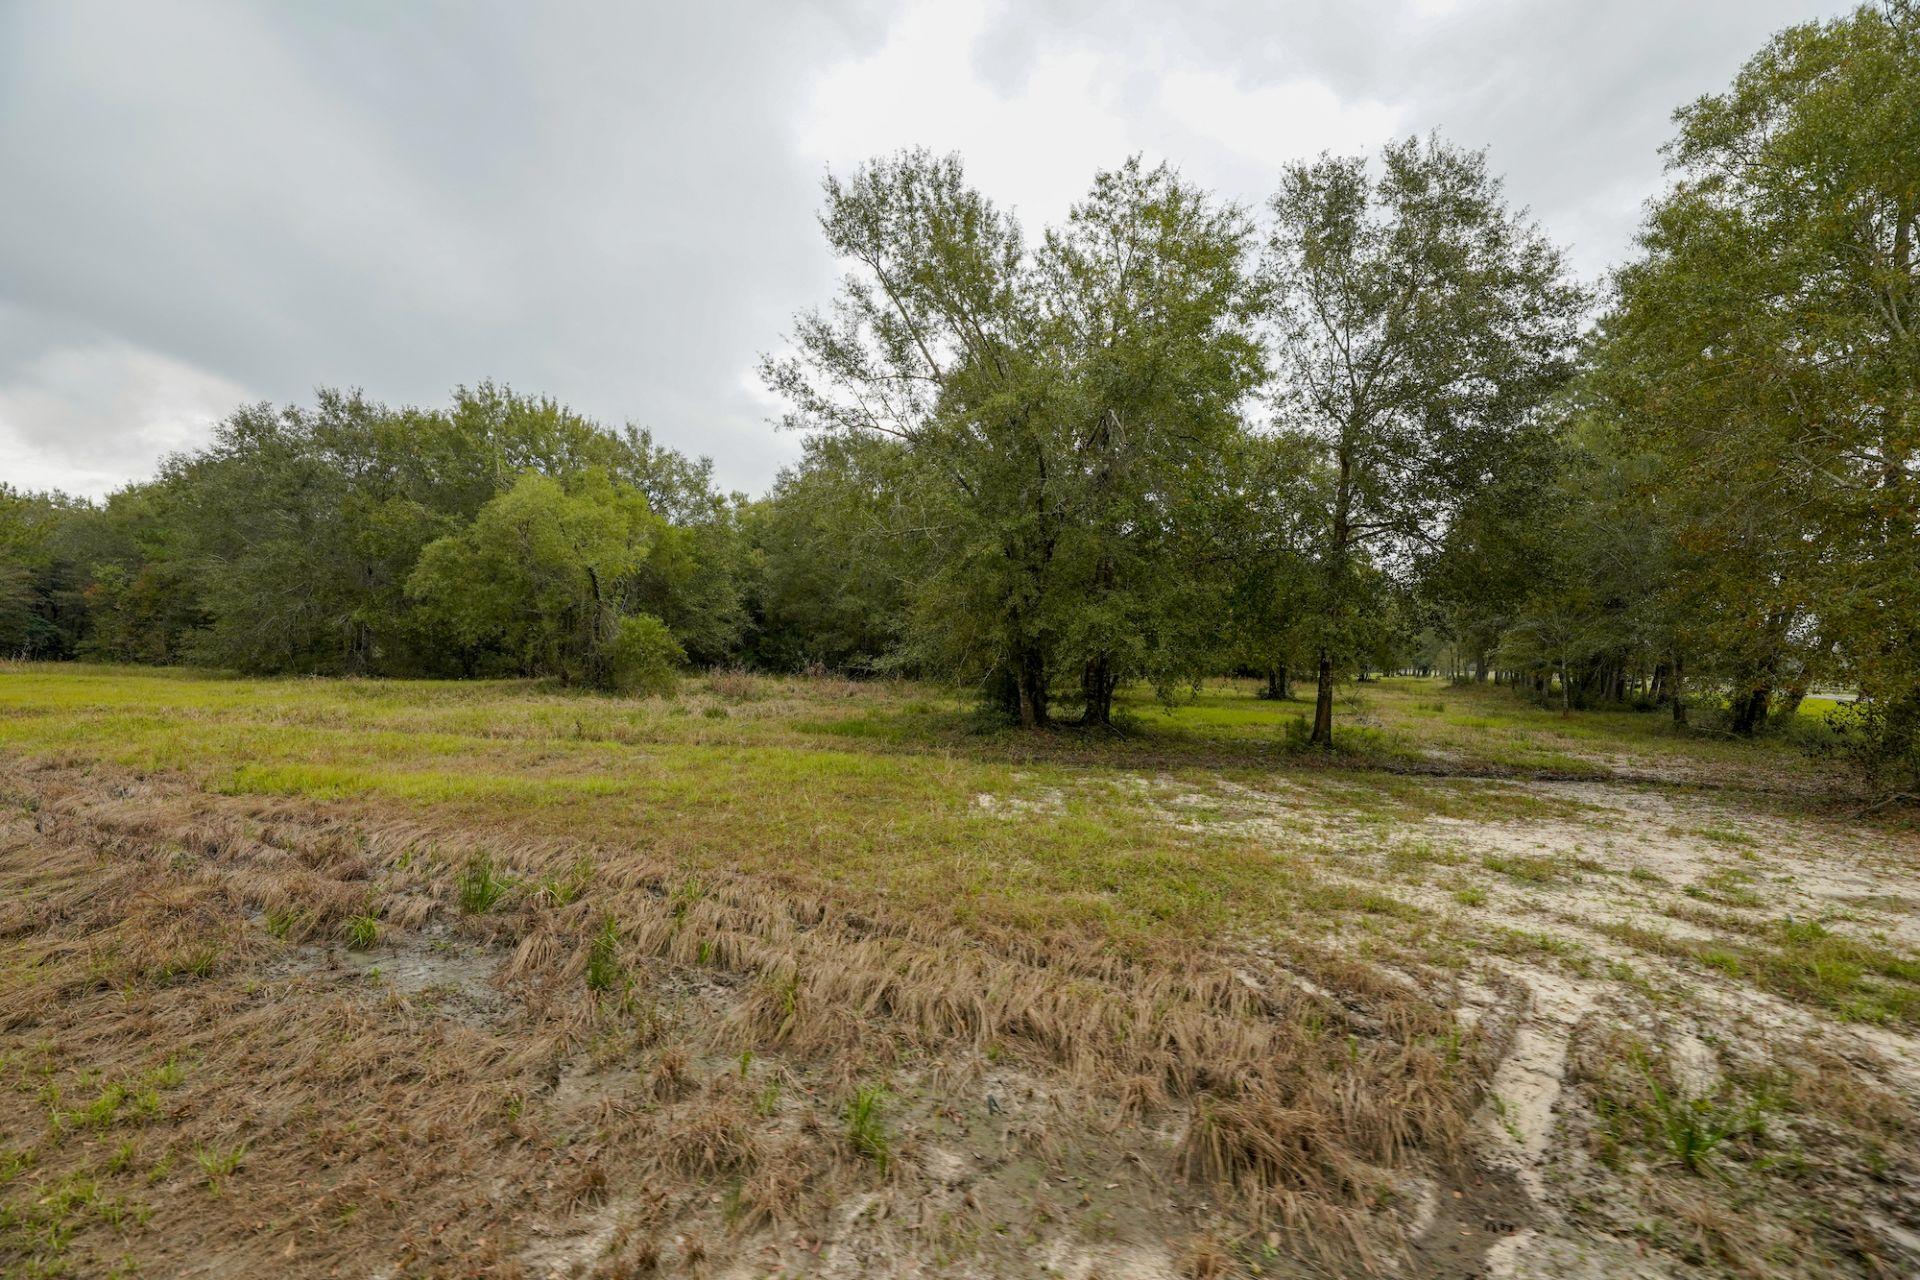 Lot 7 - Jefferson County Development Land